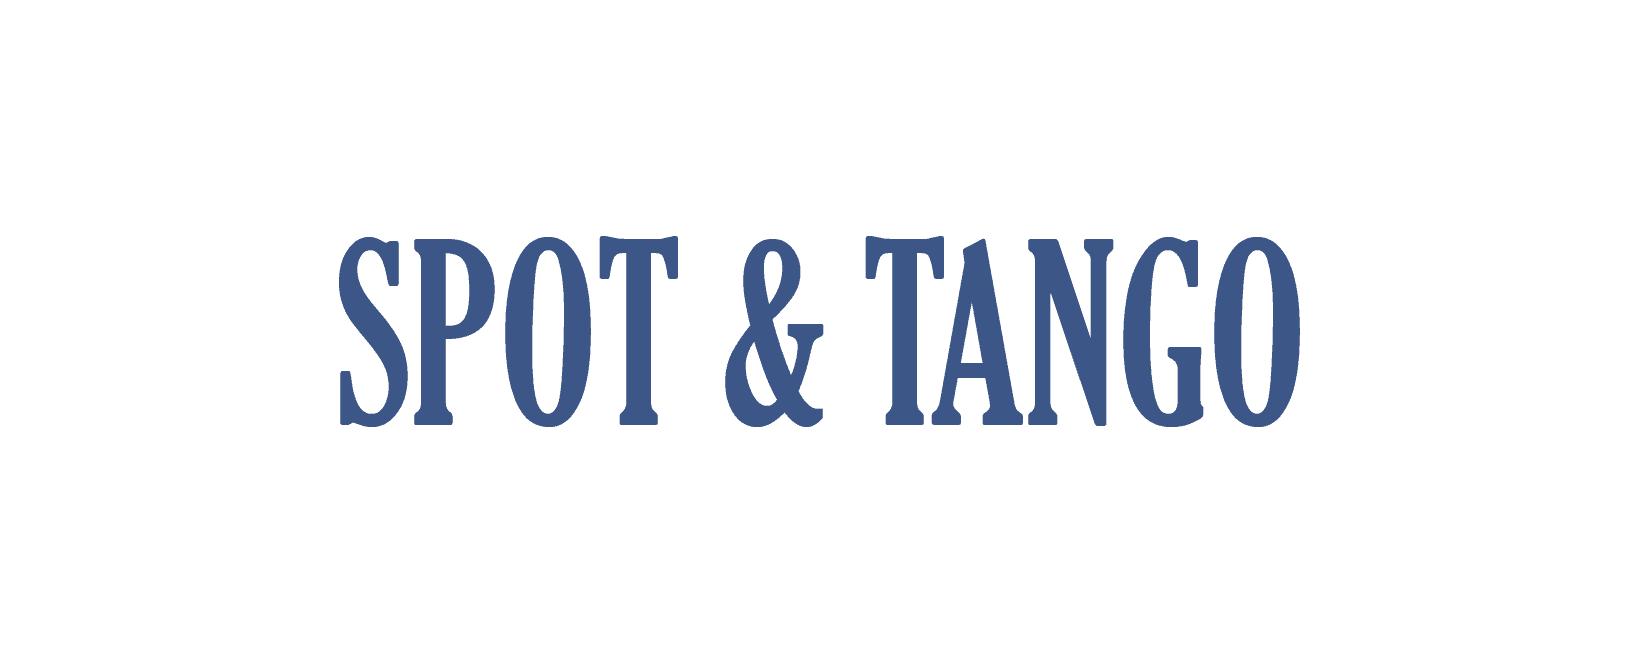 Spot & Tango Discount Code 2021